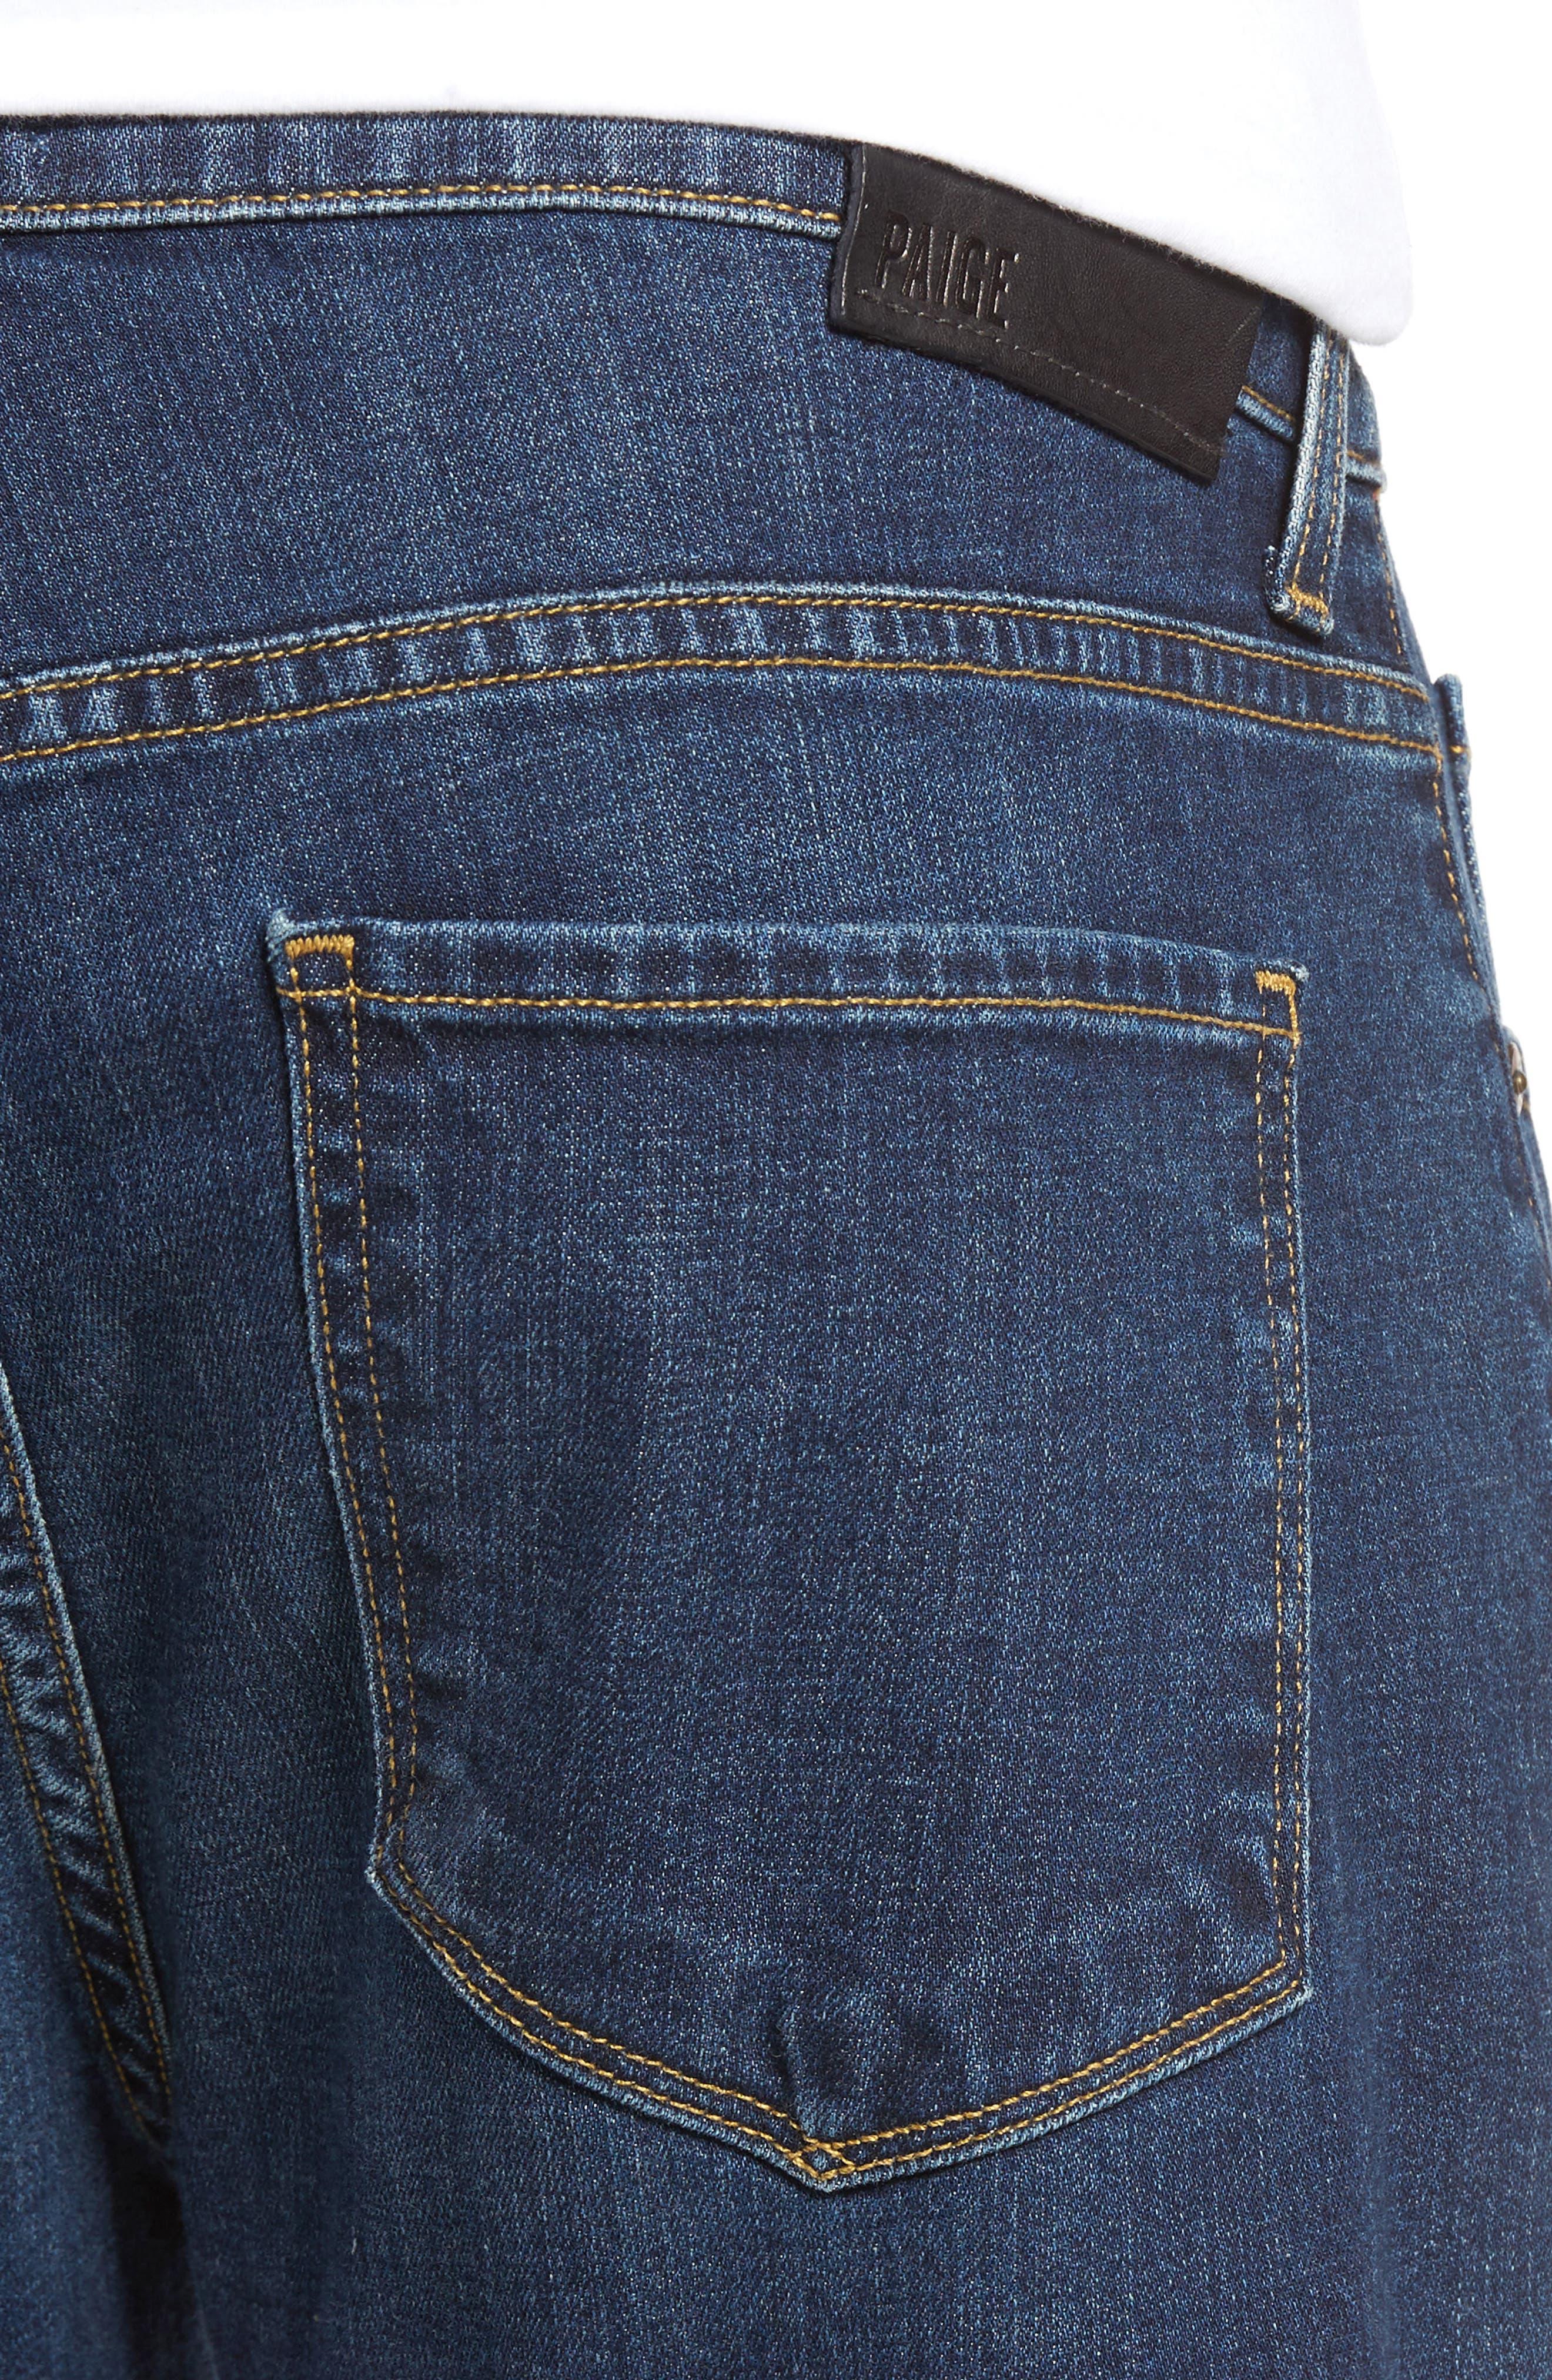 Normandie Straight Leg Jeans,                             Alternate thumbnail 4, color,                             ANGELO